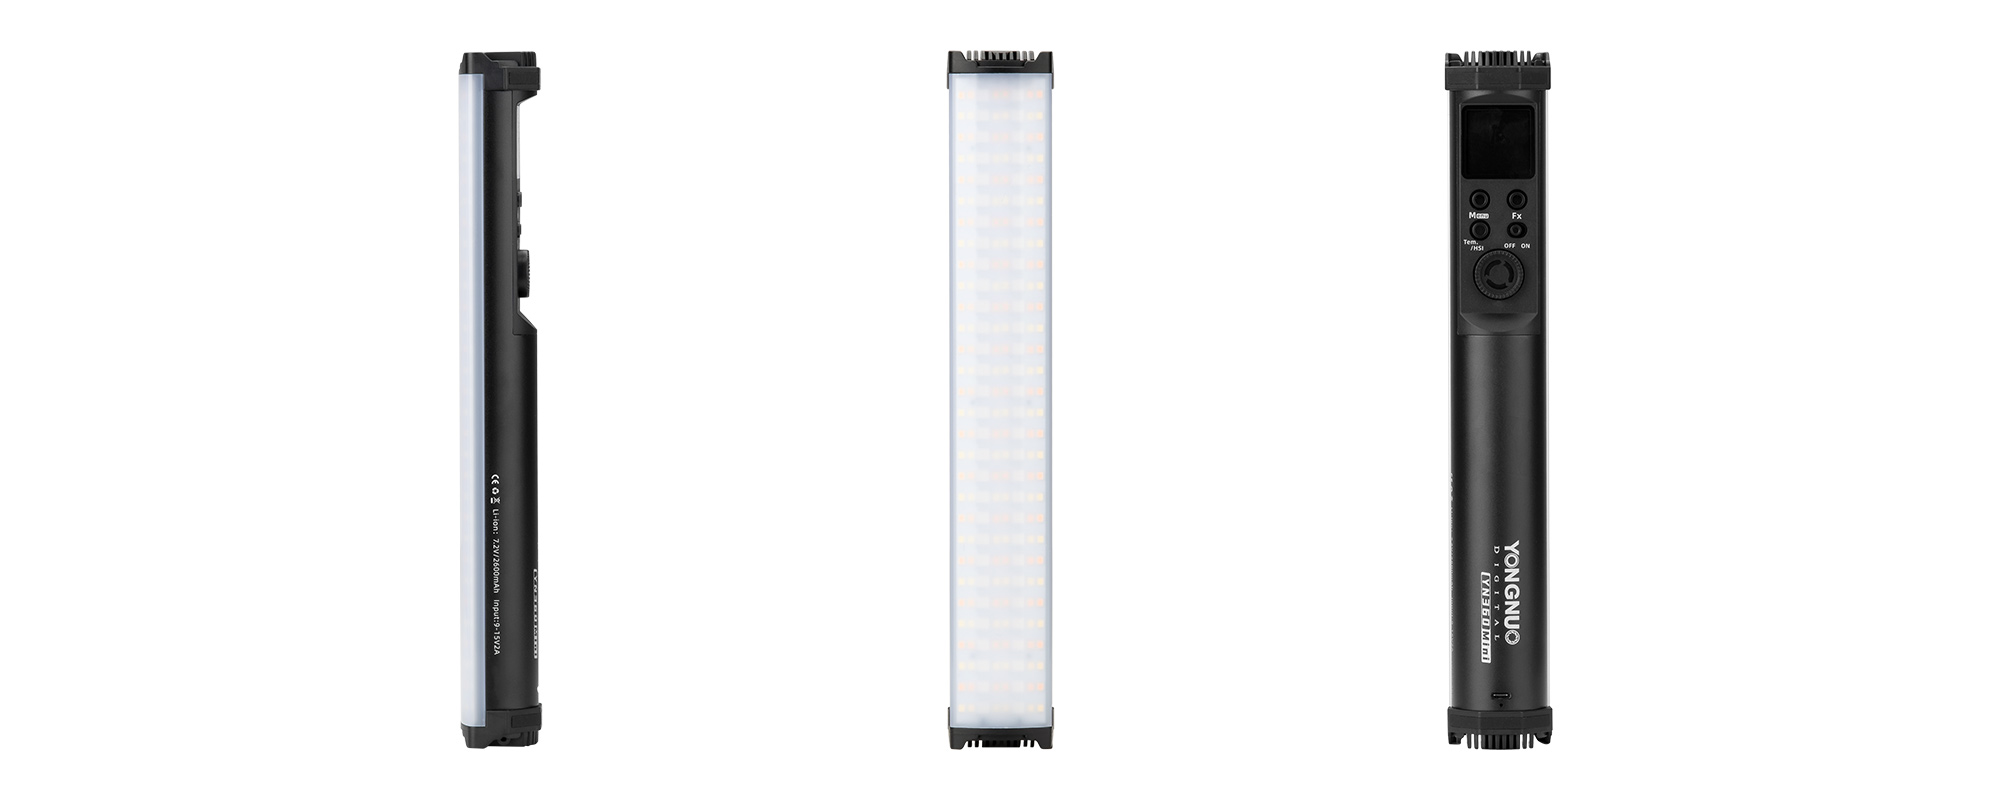 Lampa LED Yongnuo YN360 Mini - RGB, WB (2700 K - 7500 K) - Lekka, mobilna i wielozadaniowa